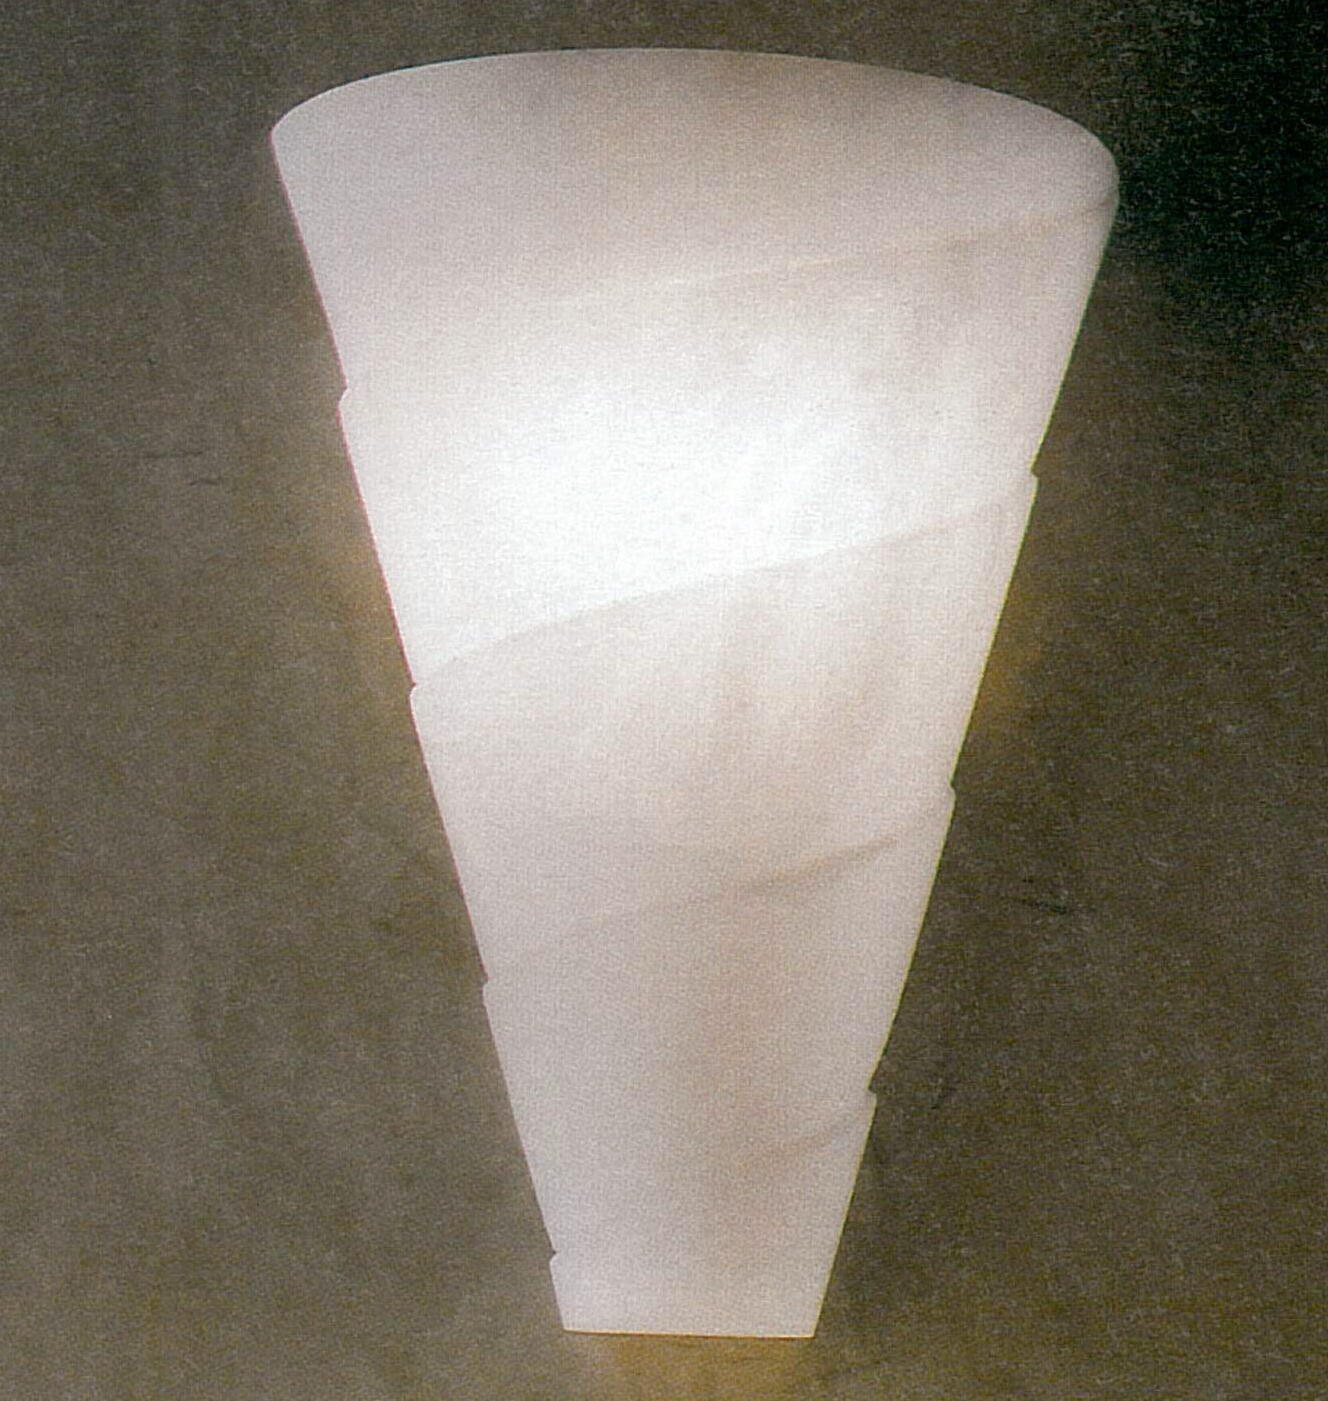 UL2903